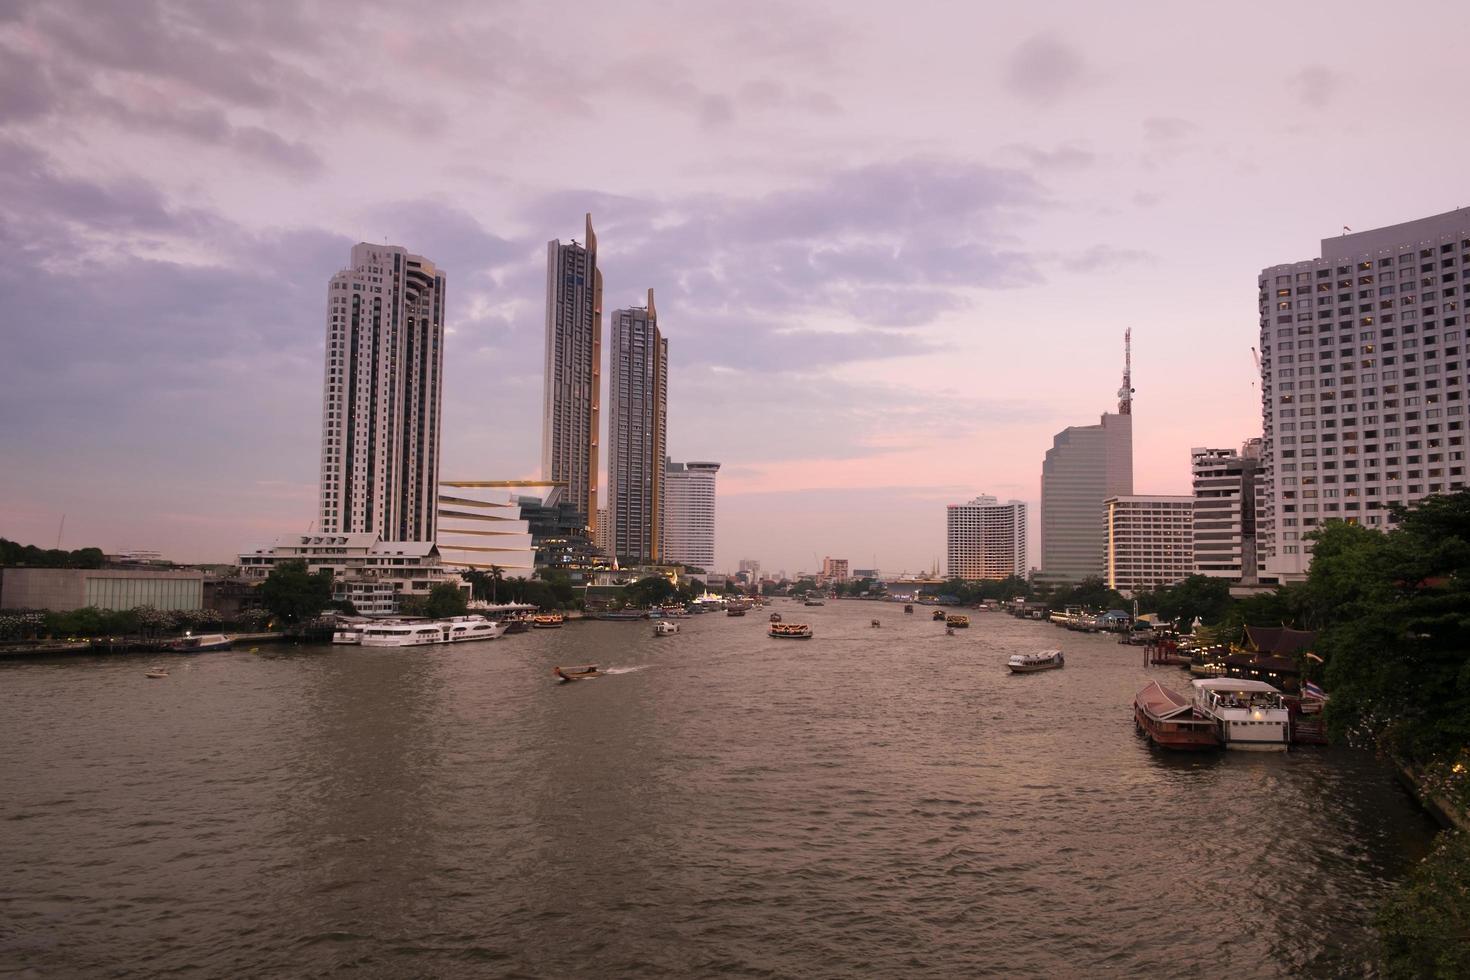 zonsondergang bij chao phraya rivier foto